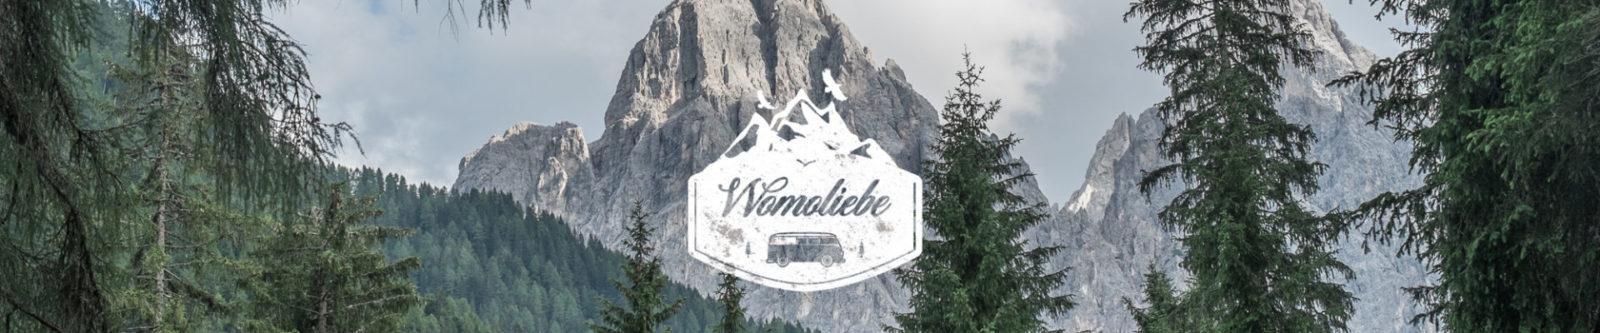 Schlagwort: Südtirol